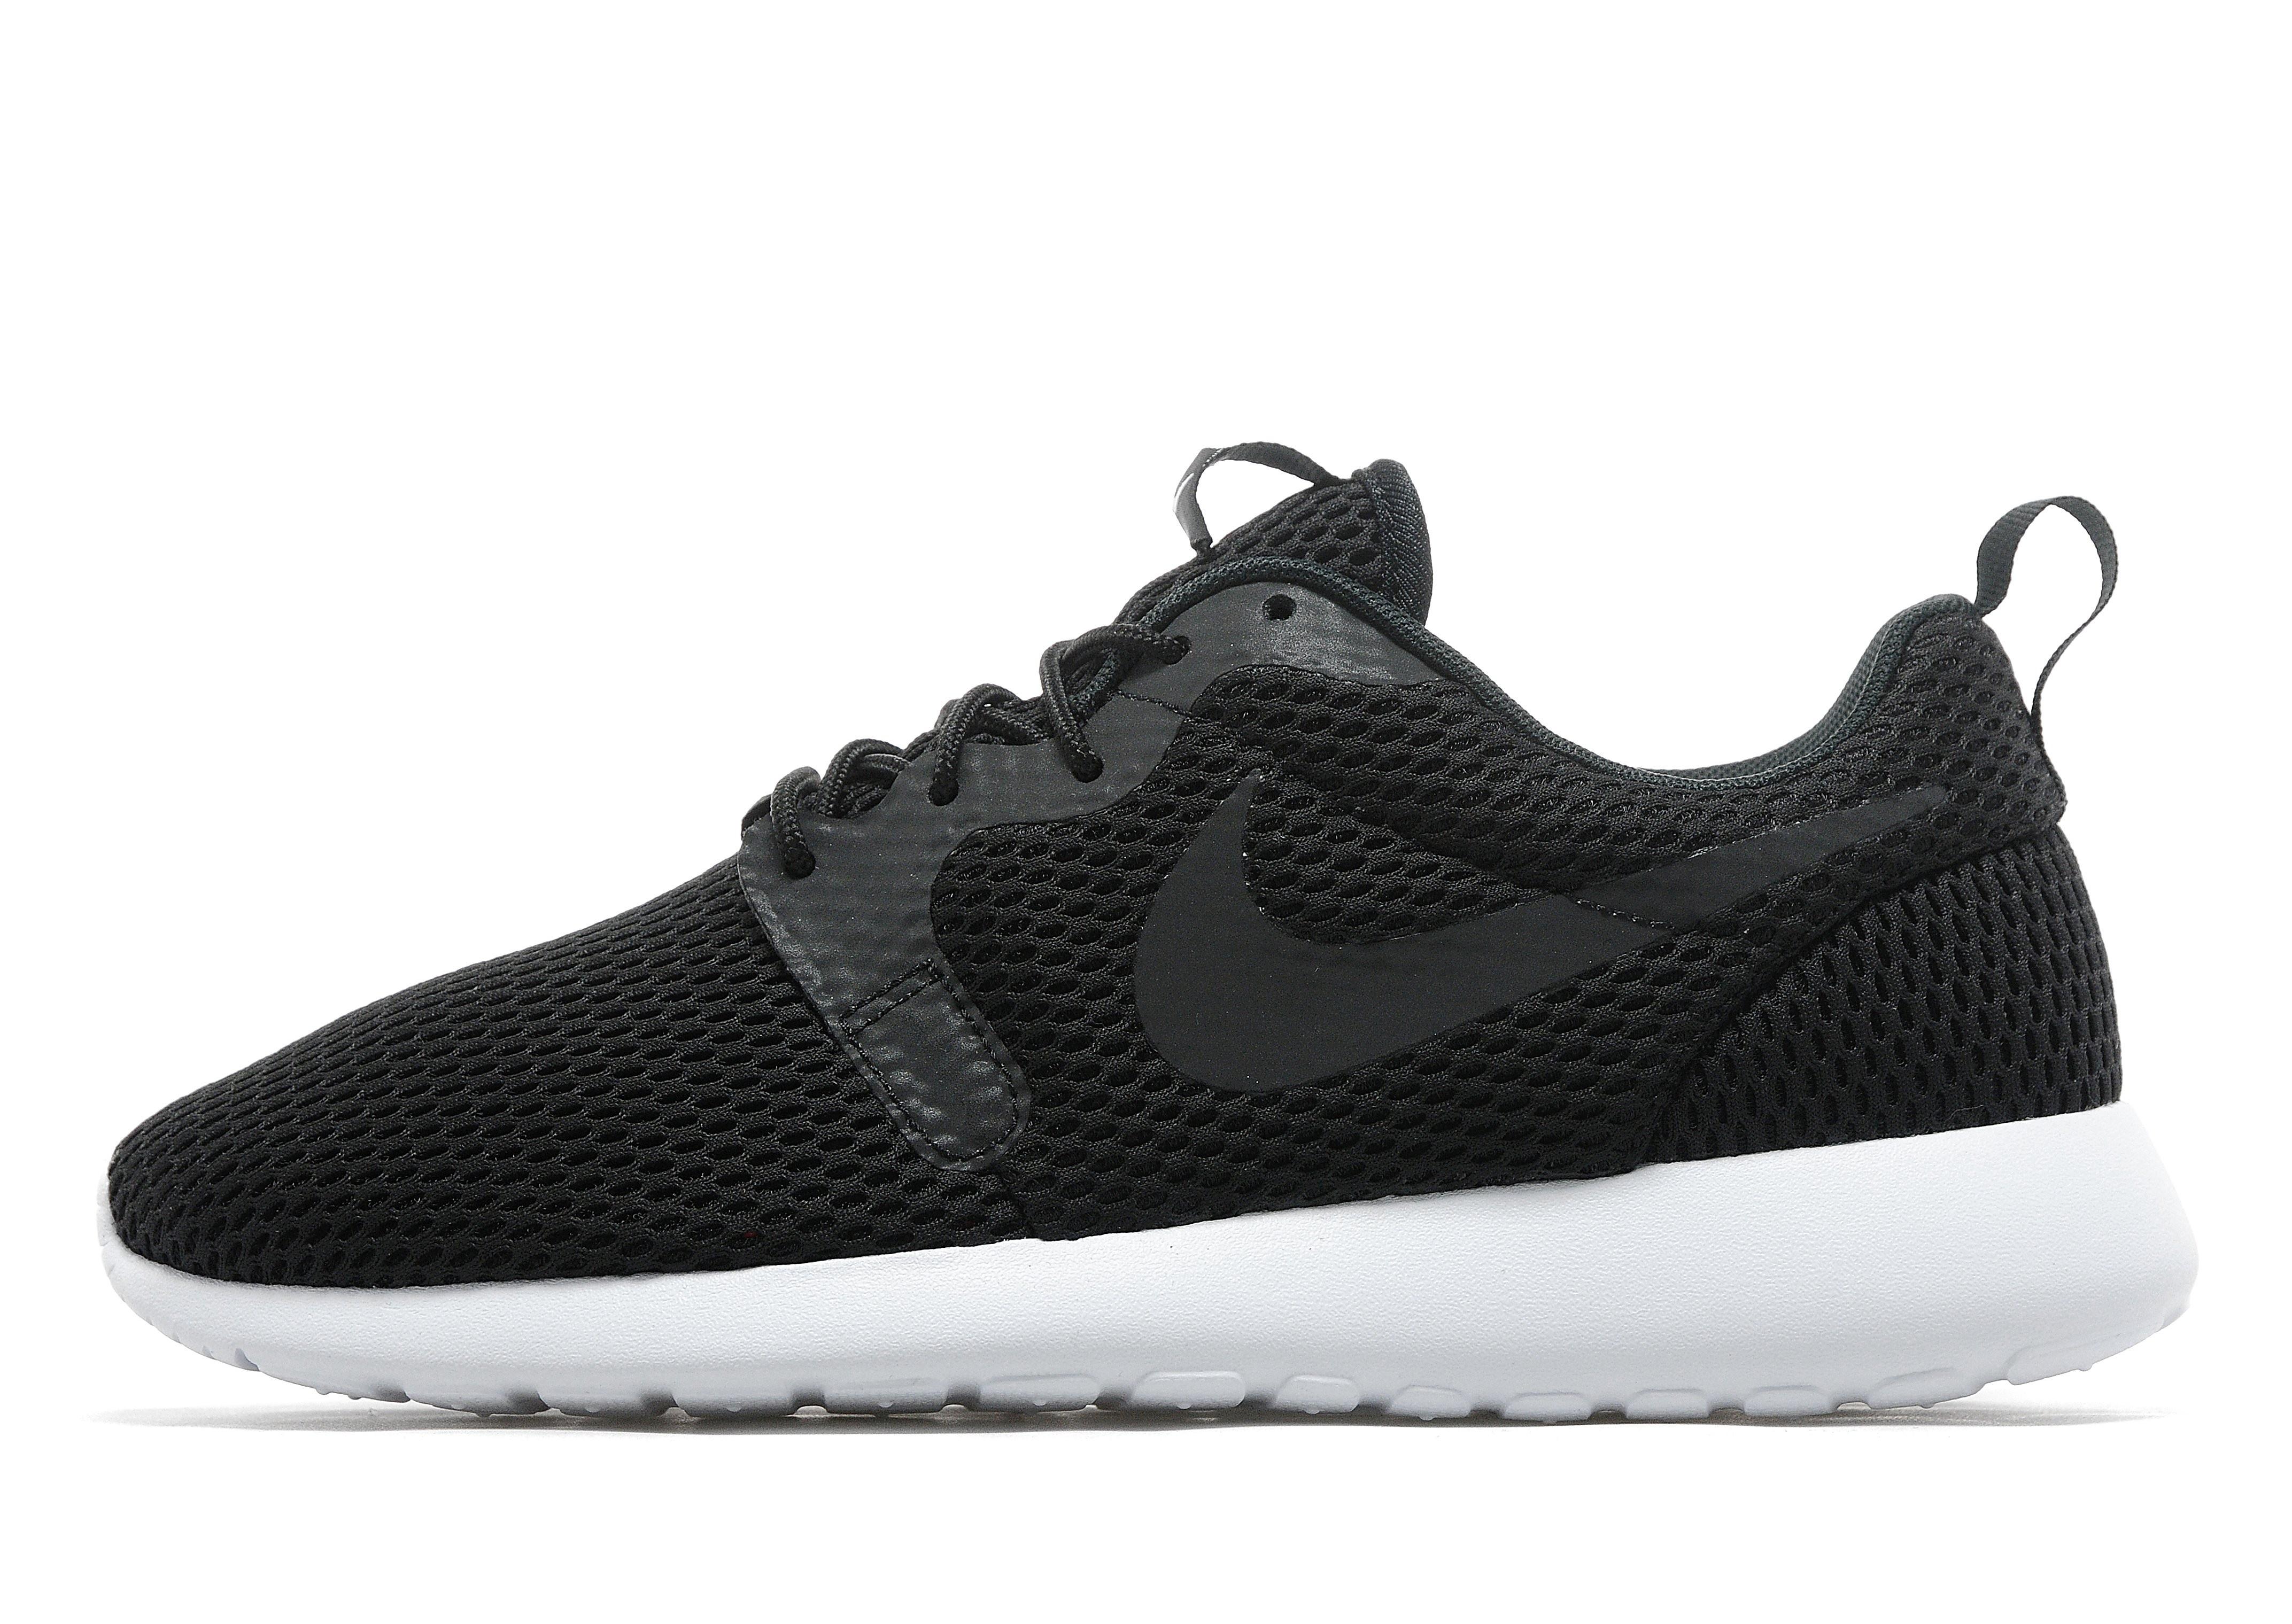 Nike Roshe One Hyperfuse 'Breathe'